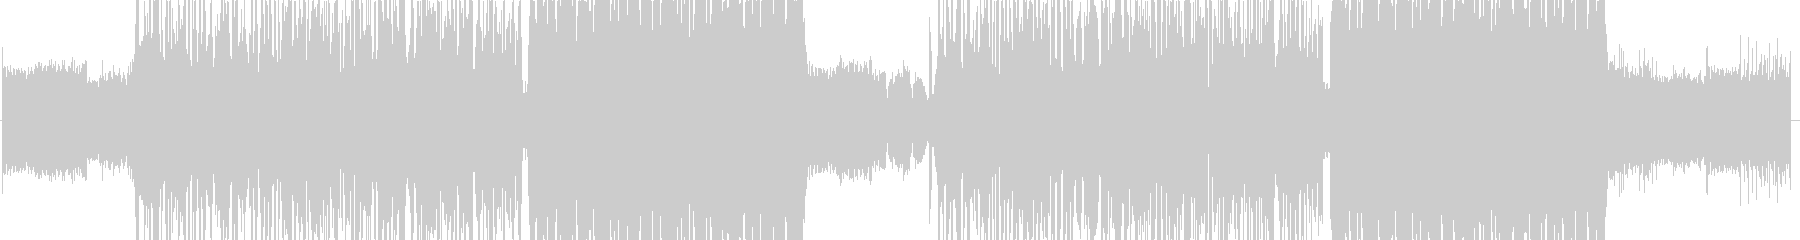 Fidgetの未再生の波形